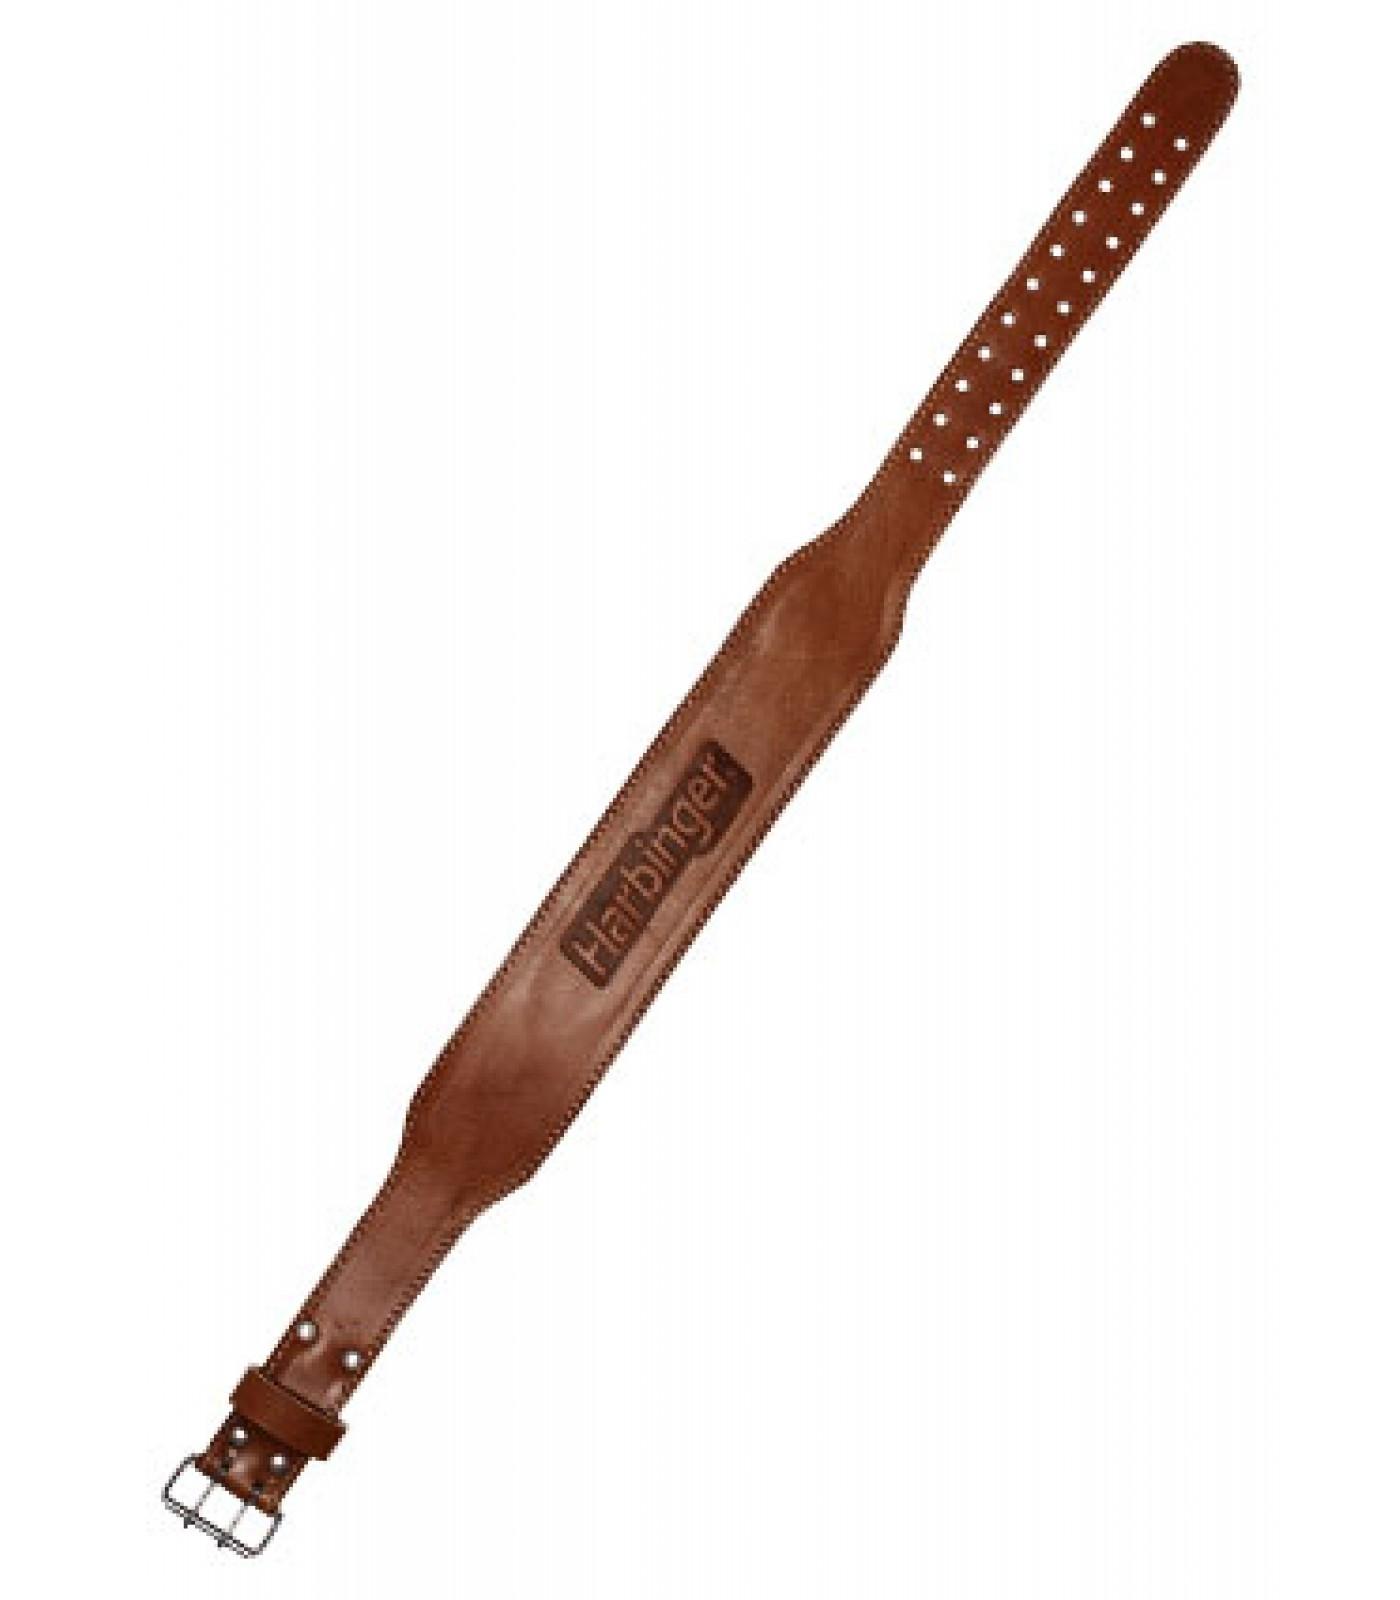 Harbinger - Кожен колан импрегниран - 15 см. ширина